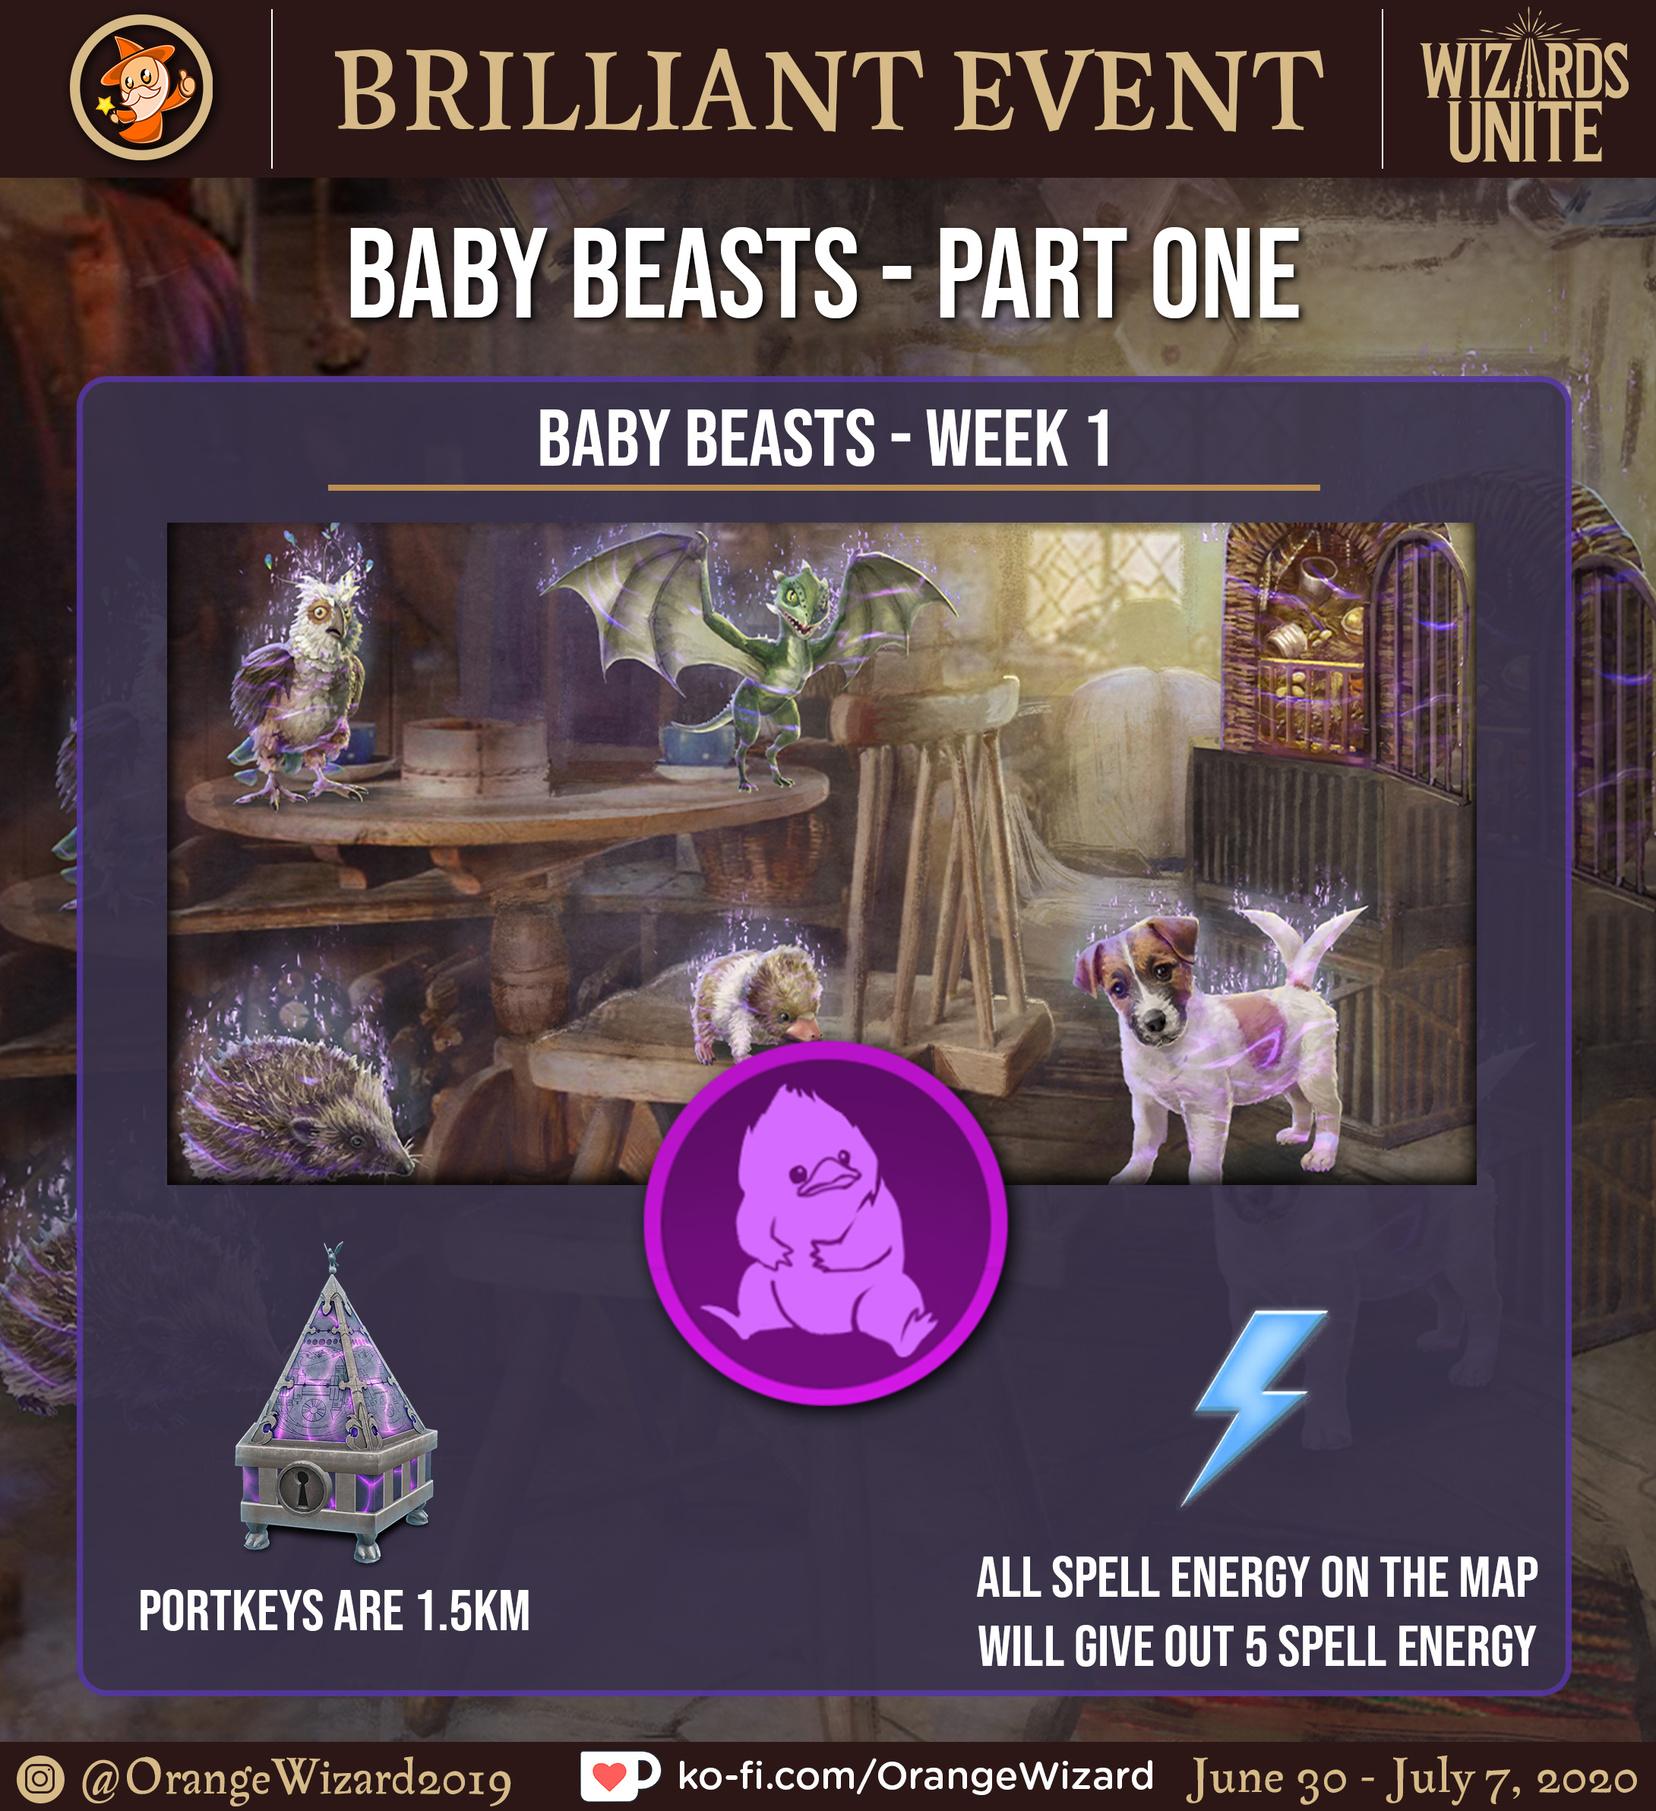 BRILLIANT_EVENT_-_BABY_BEASTS_I_-_INTRO.jpg